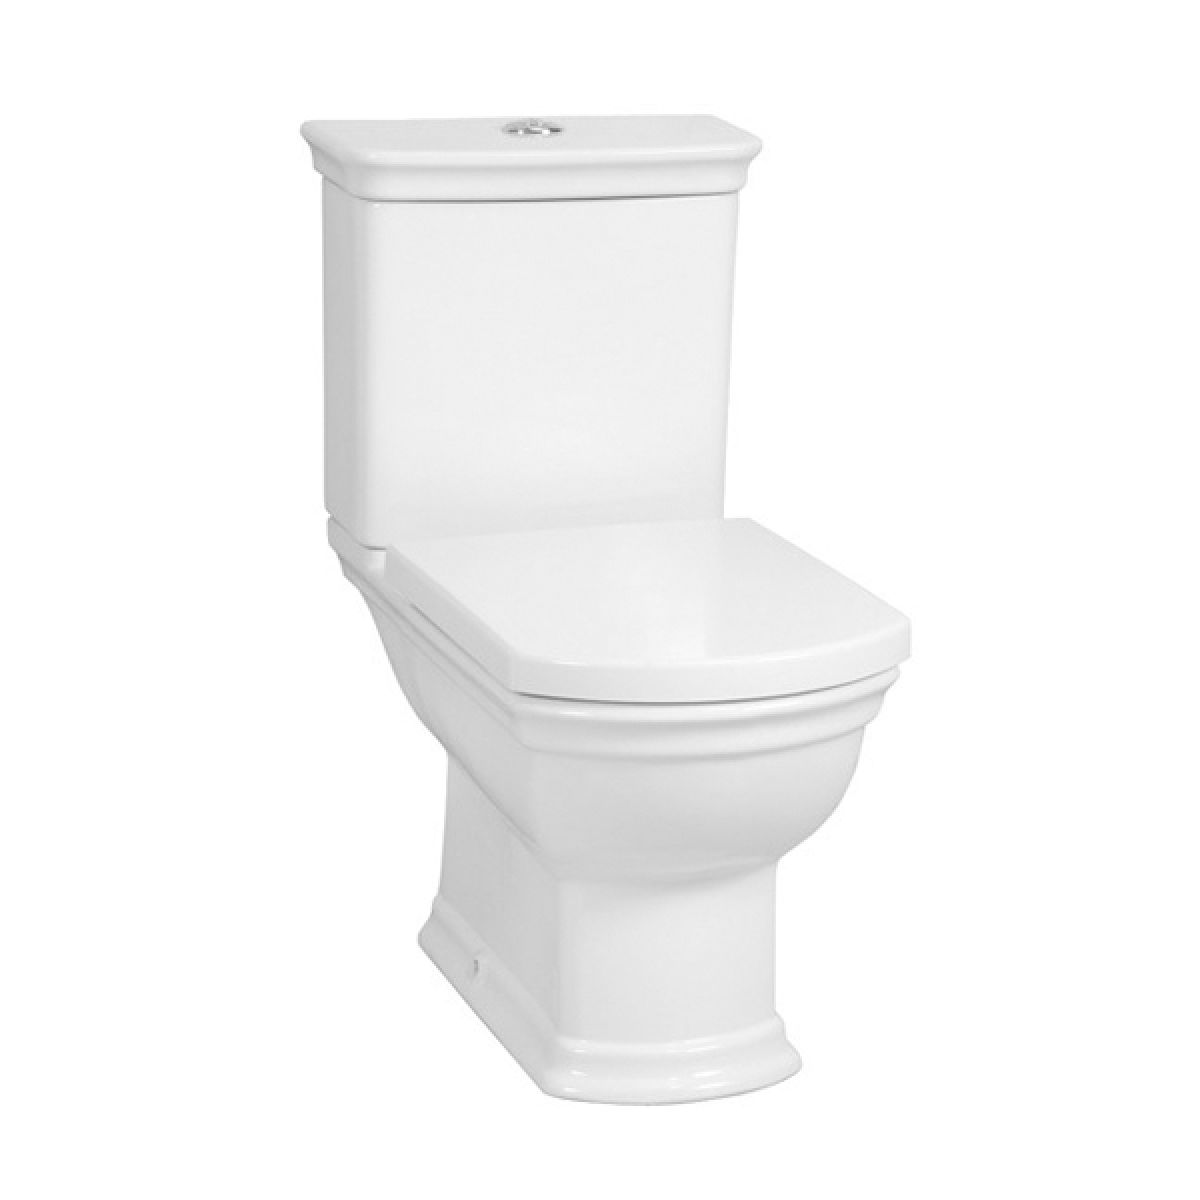 Vitra Serenada Close Coupled Open Back Toilet